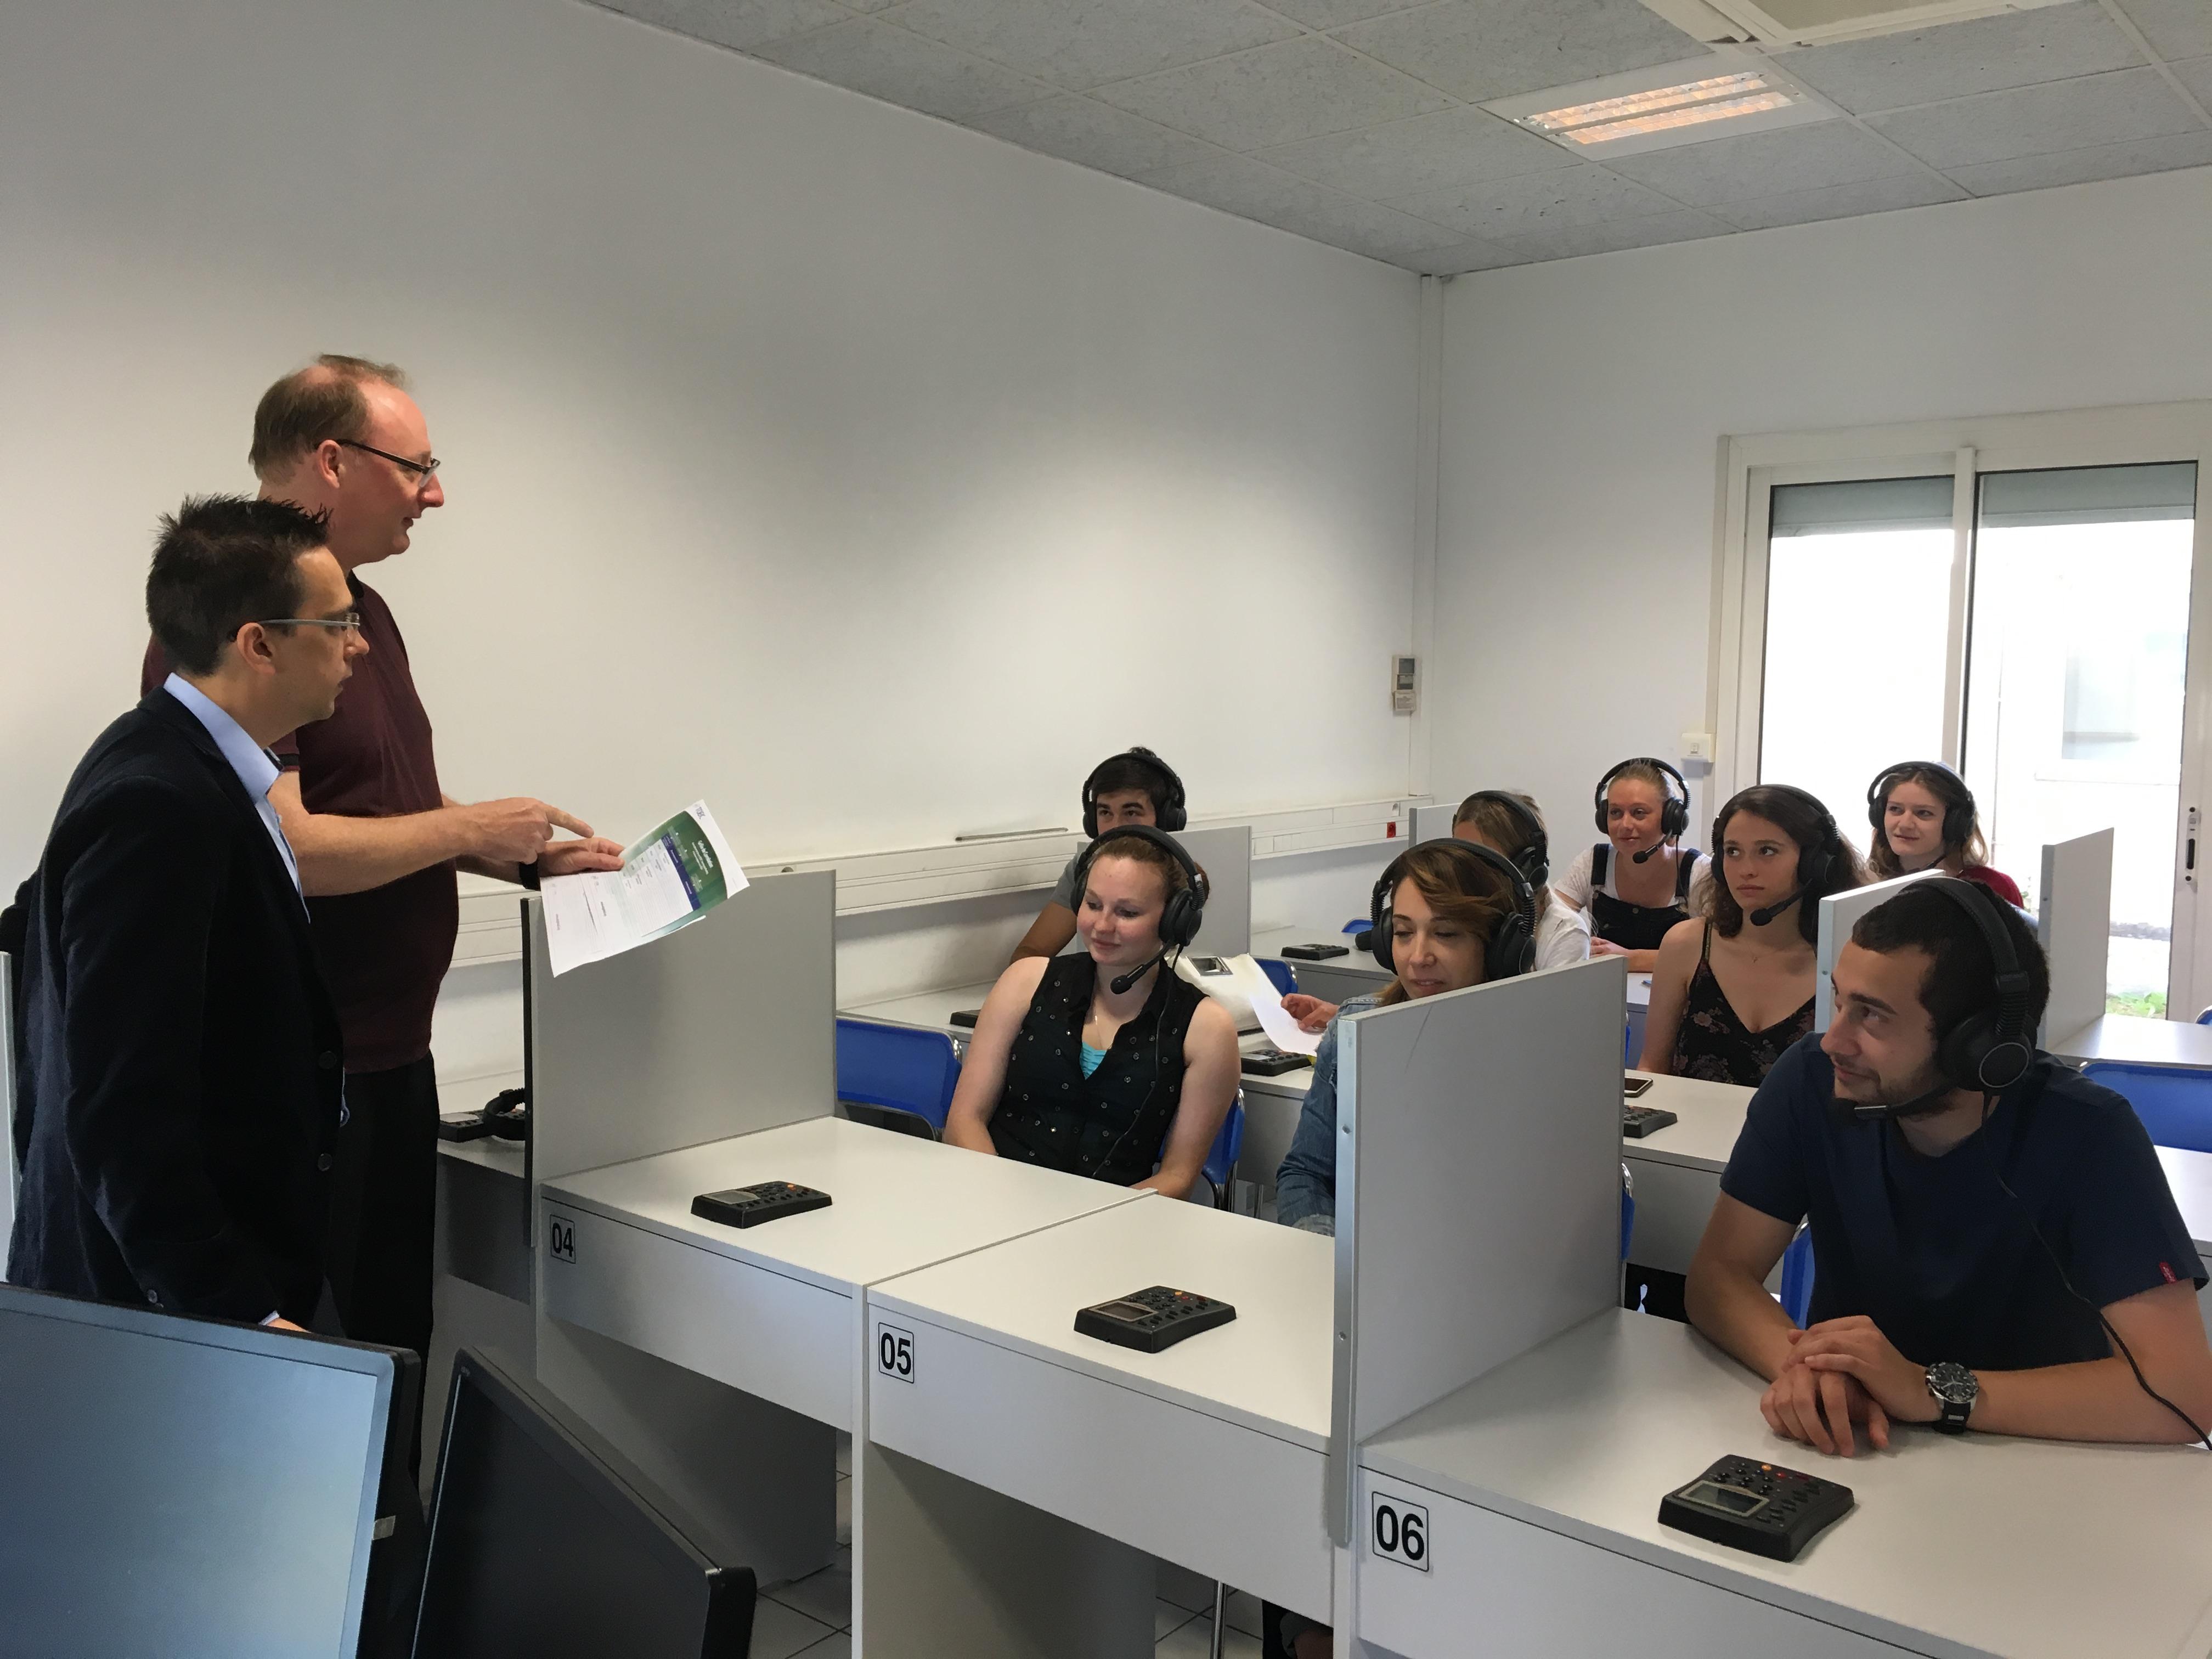 L'Institut consulaire de formation d'Ajaccio passe au E-learning